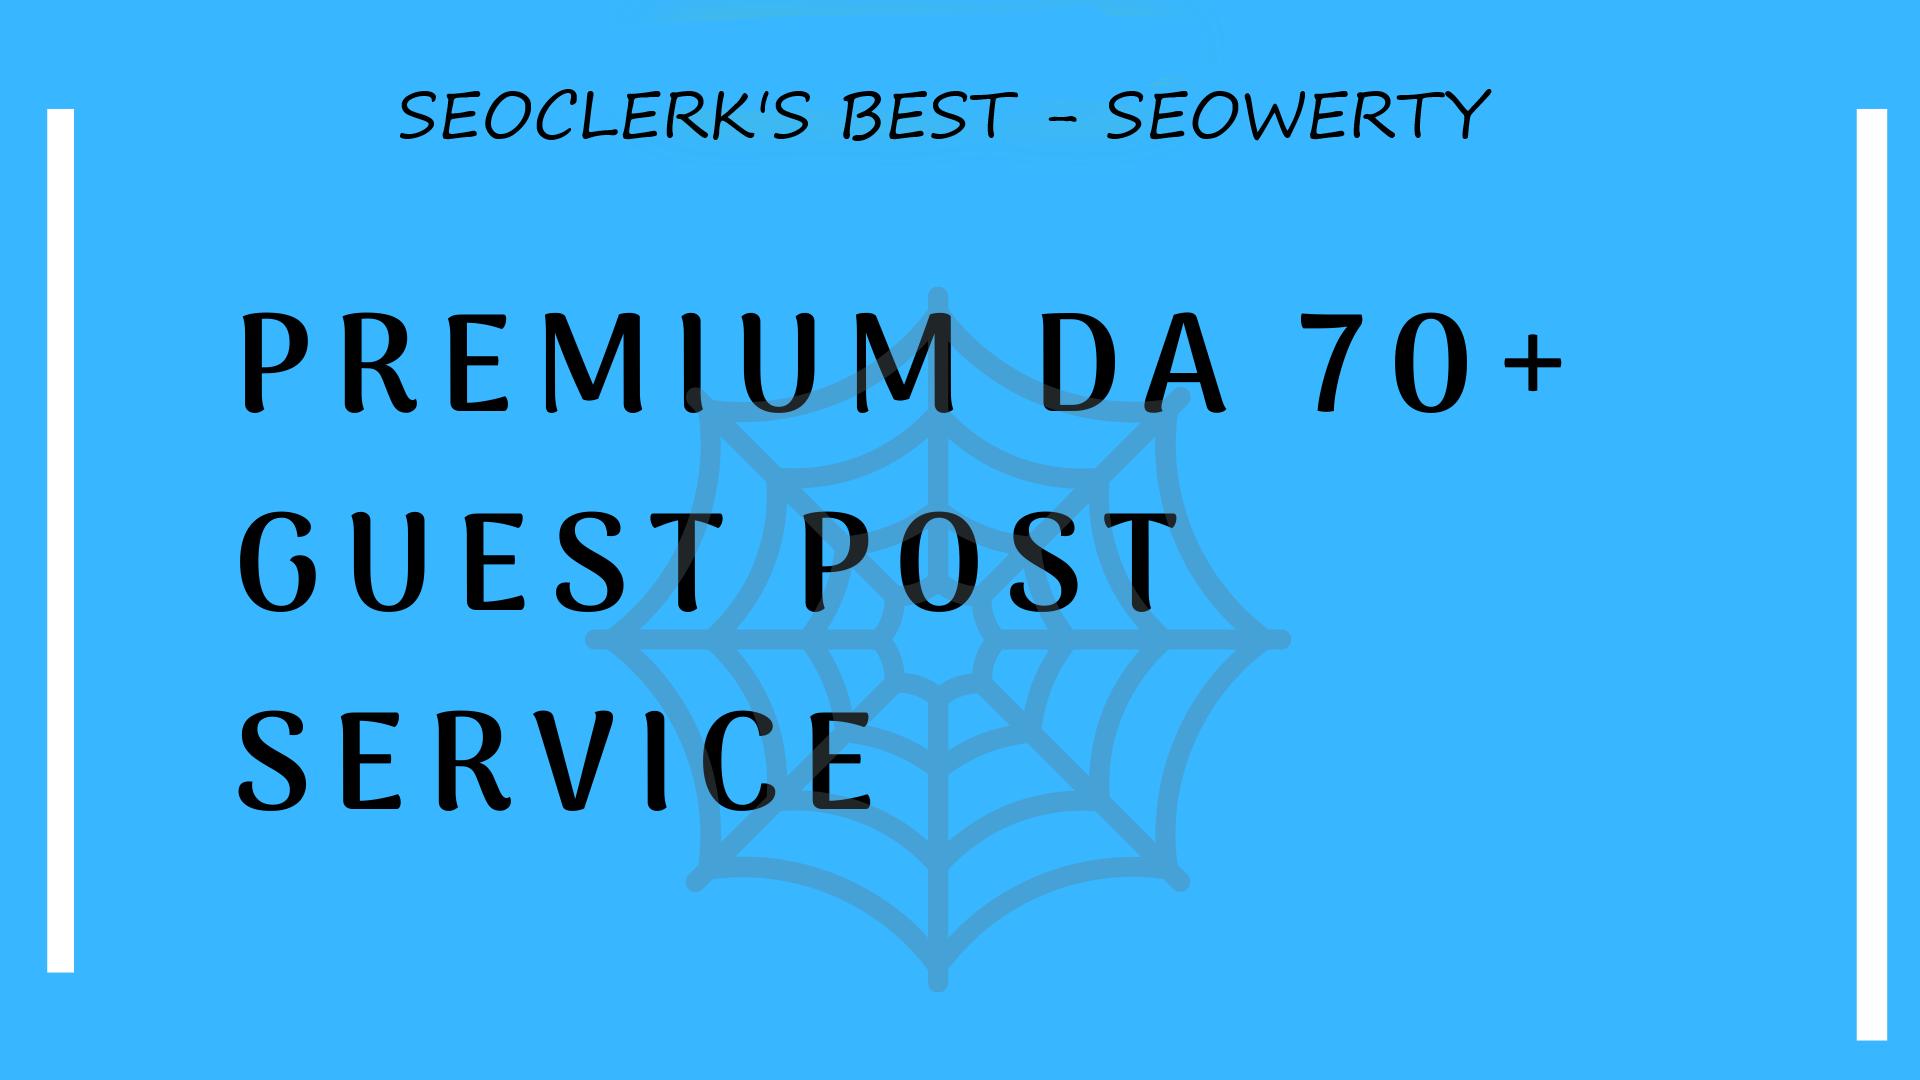 15 Premium DA 90 Guest Post Service - High Quality Content